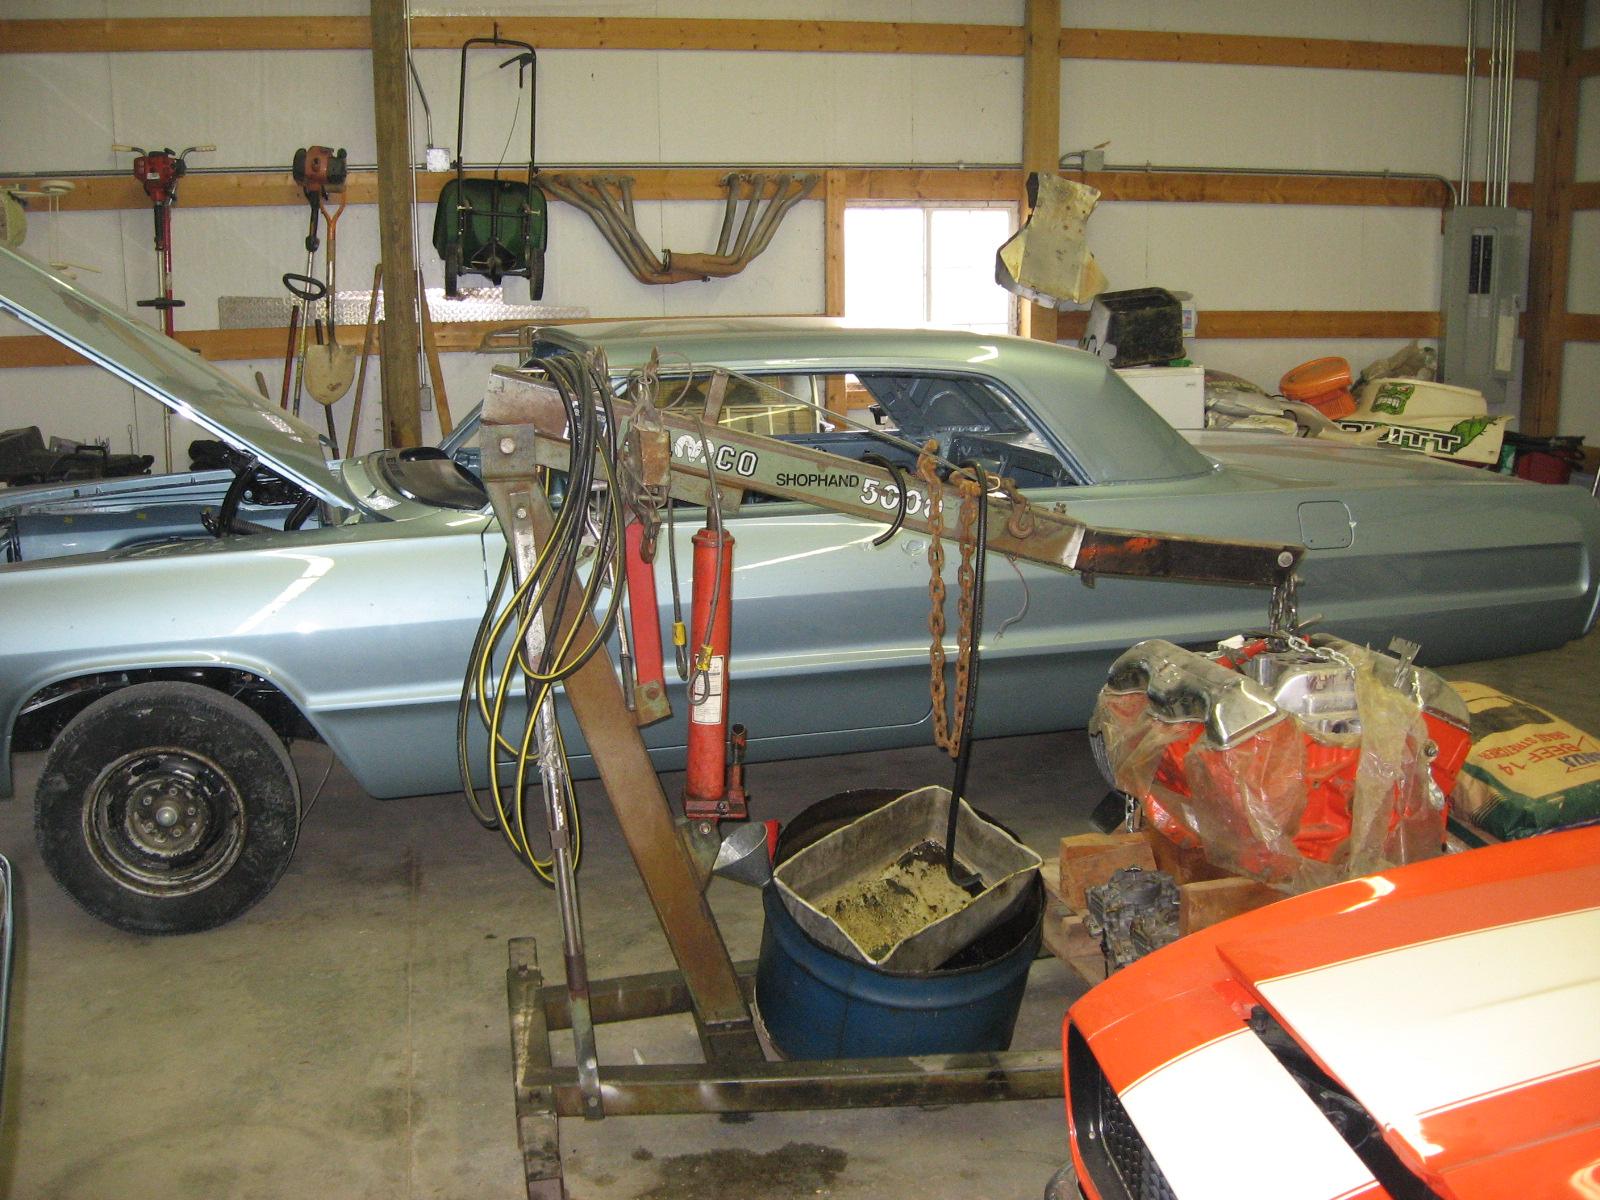 1964 Impala SS paint job - Hot Rod Forum : Hotrodders